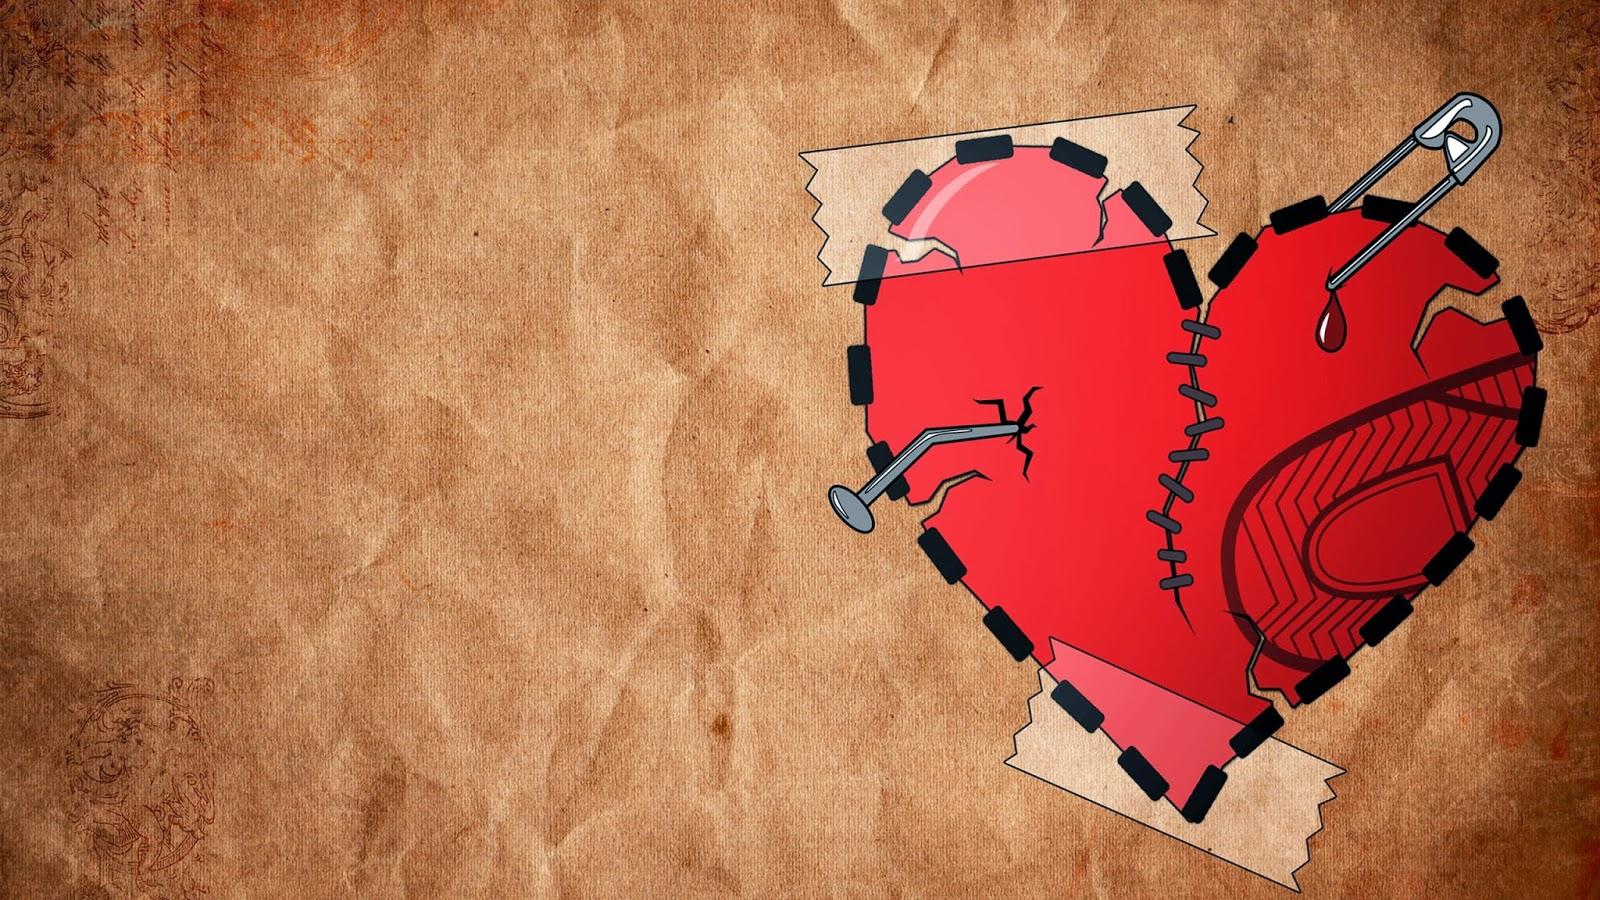 broken-heart-sewn-glued-emotional-hd-wallpaper-2560x1440-1980x1080-desktop-background-www.epichdwallpapers.com